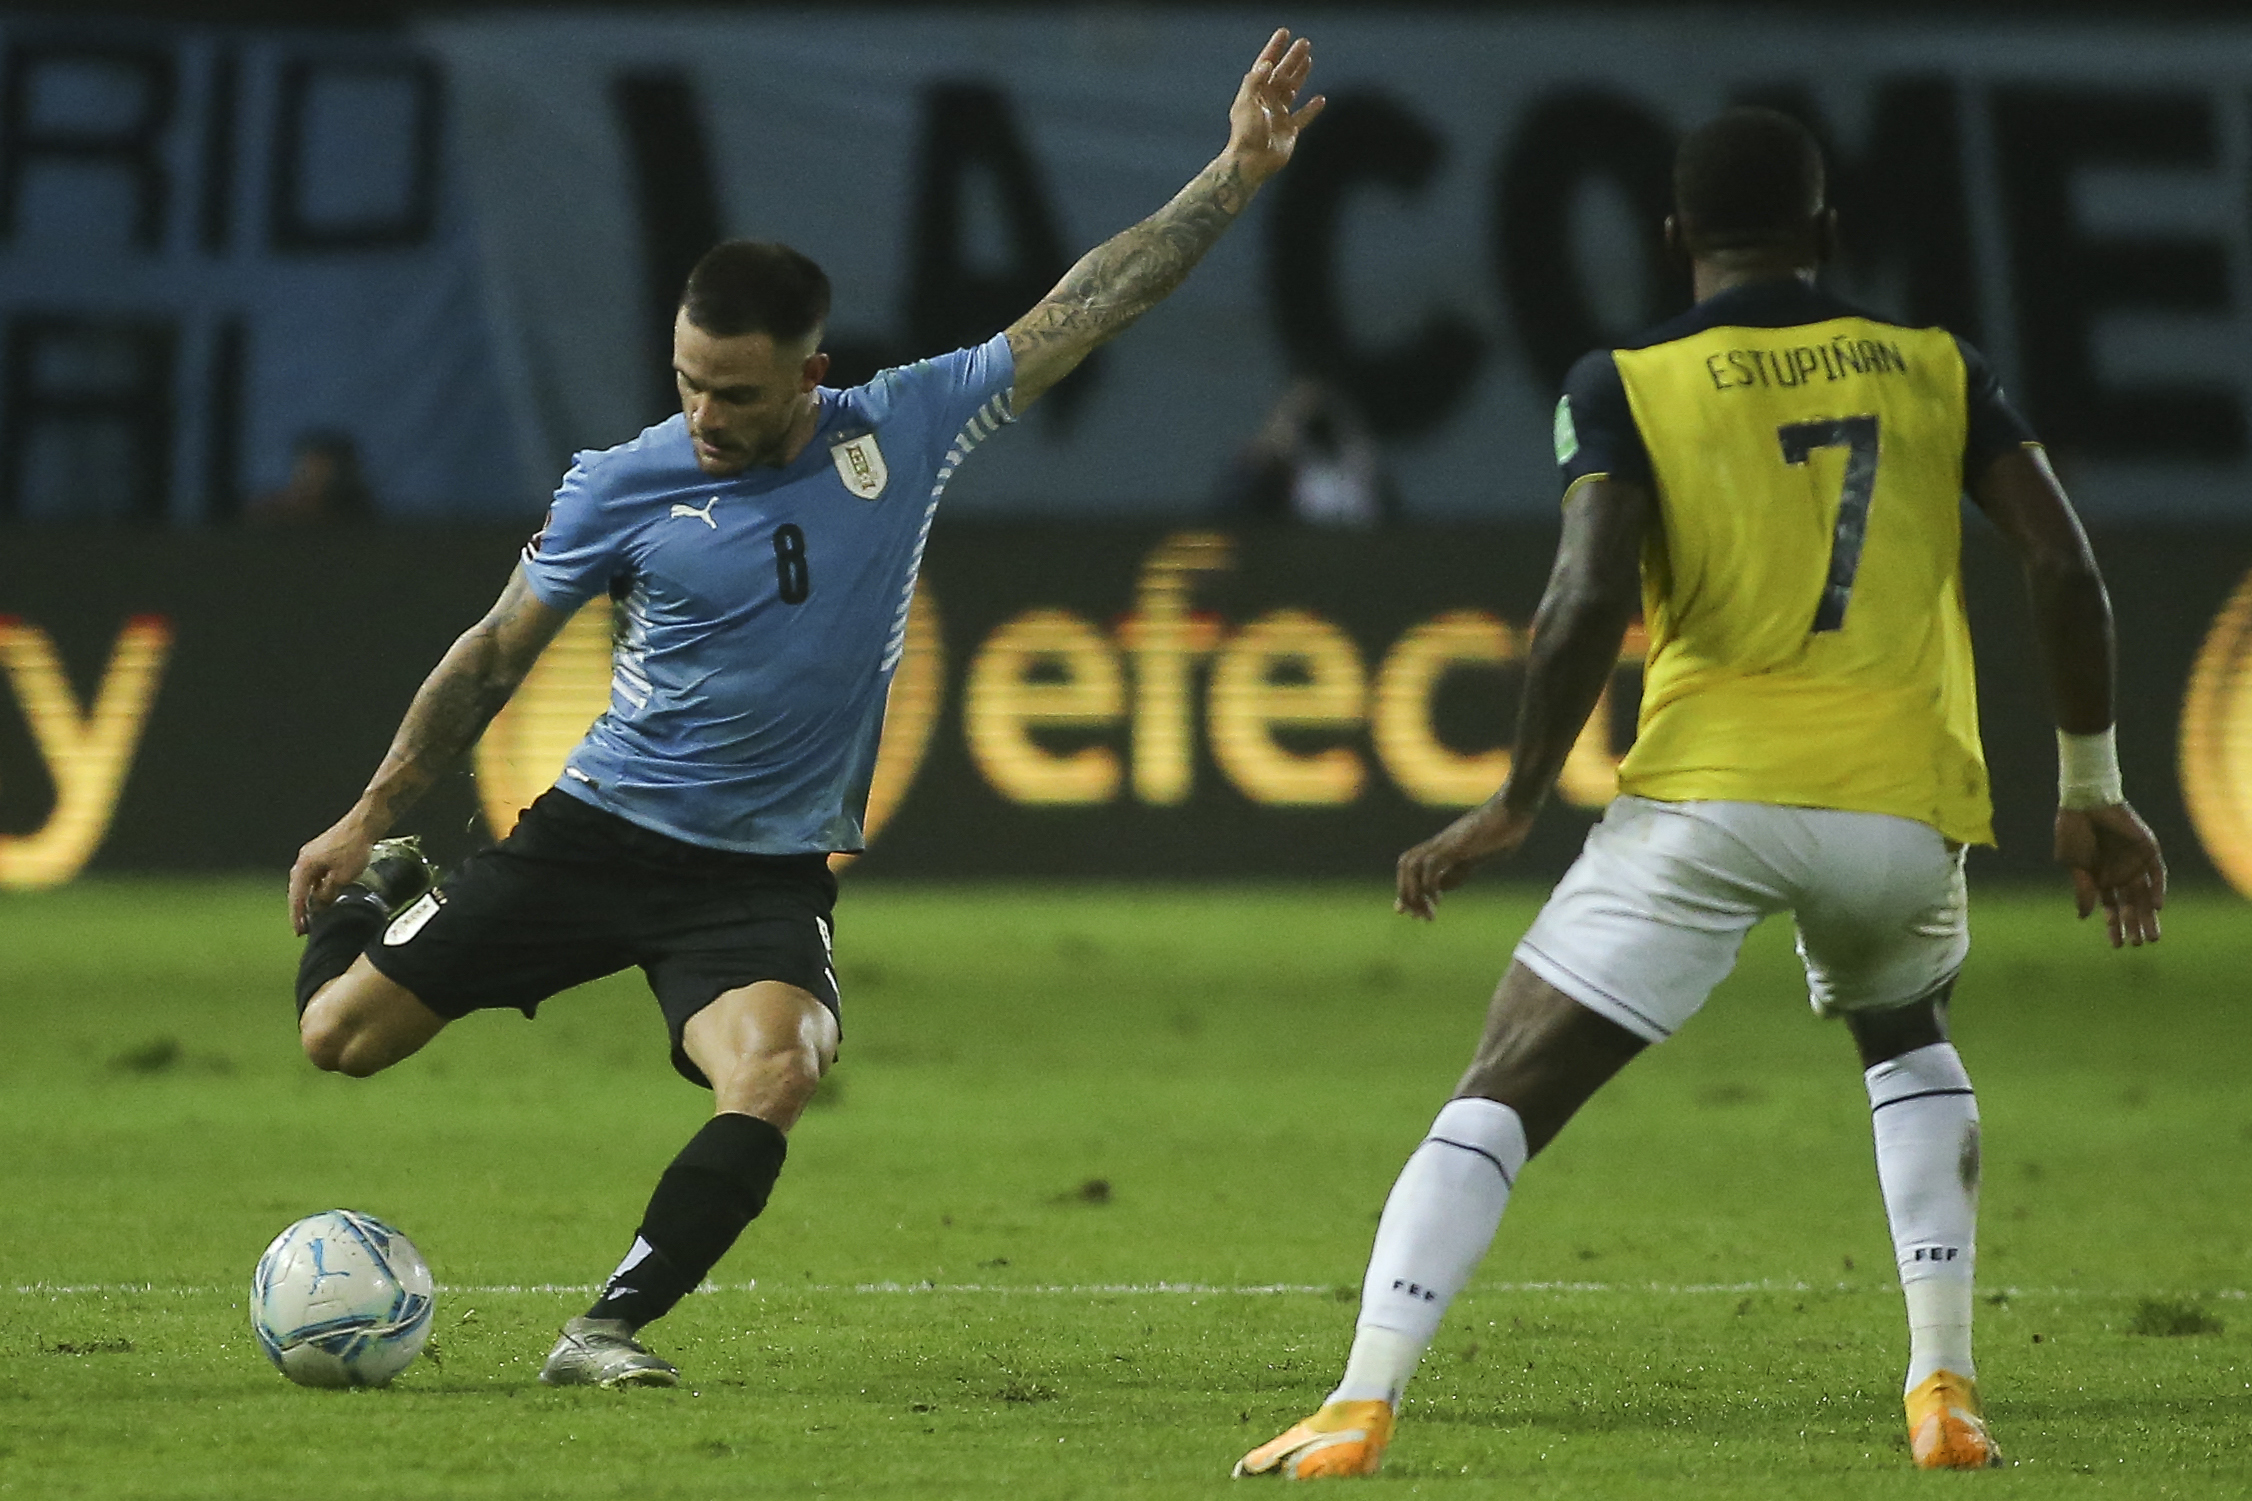 Uruguay vs Ecuador 1-0 Jornada 9 Eliminatorias CONMEBOL 2022